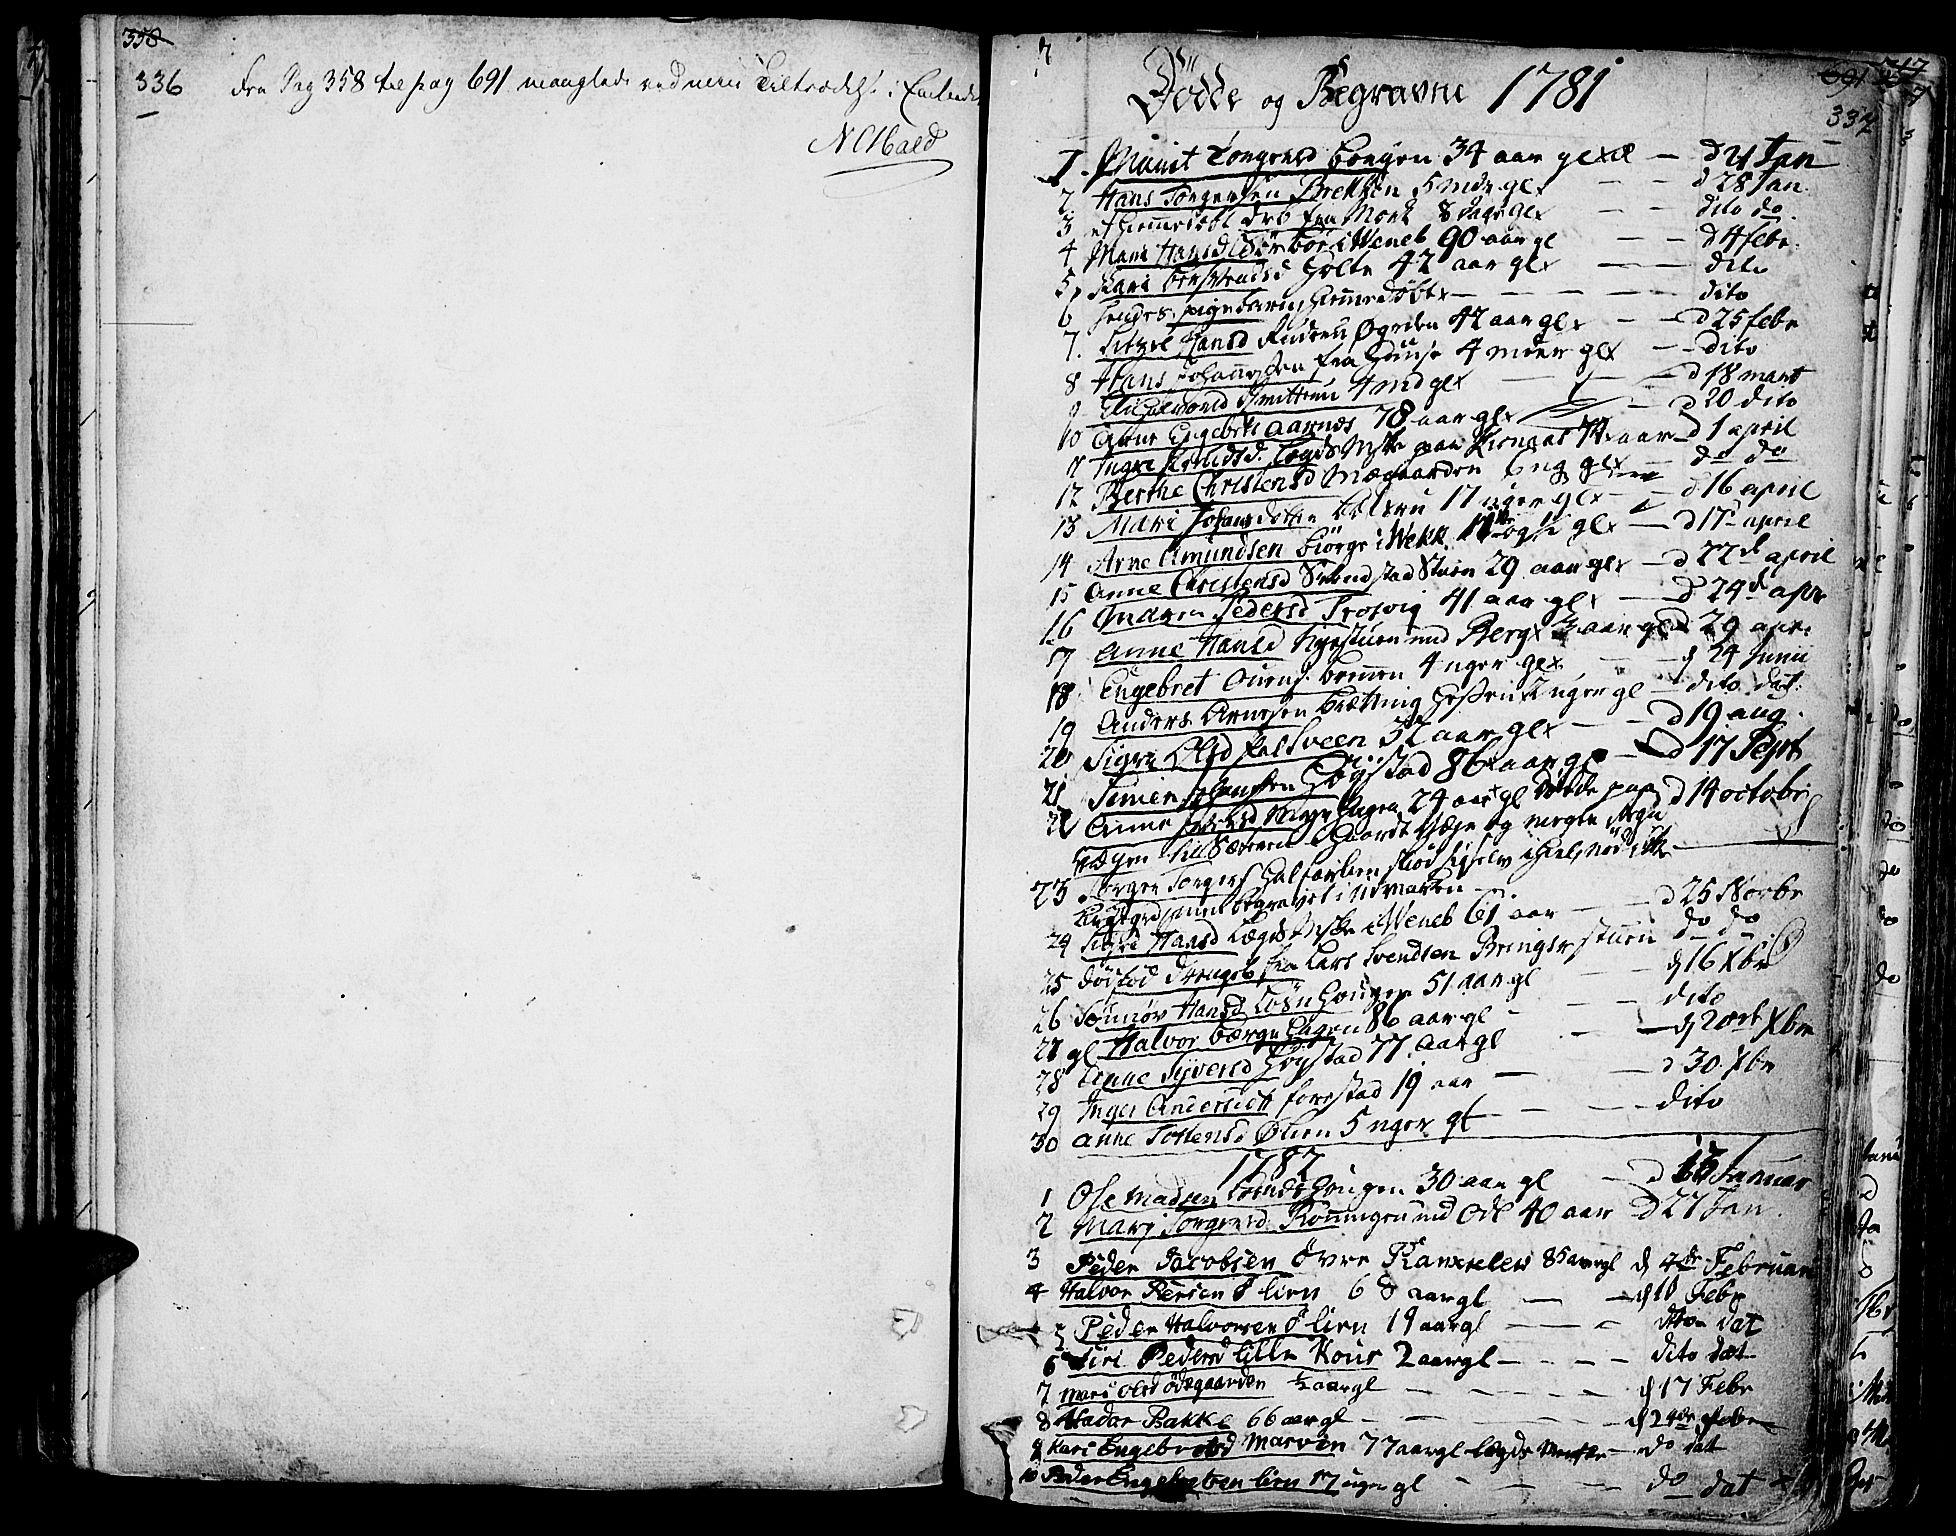 SAH, Ringebu prestekontor, Ministerialbok nr. 3, 1781-1820, s. 336-337